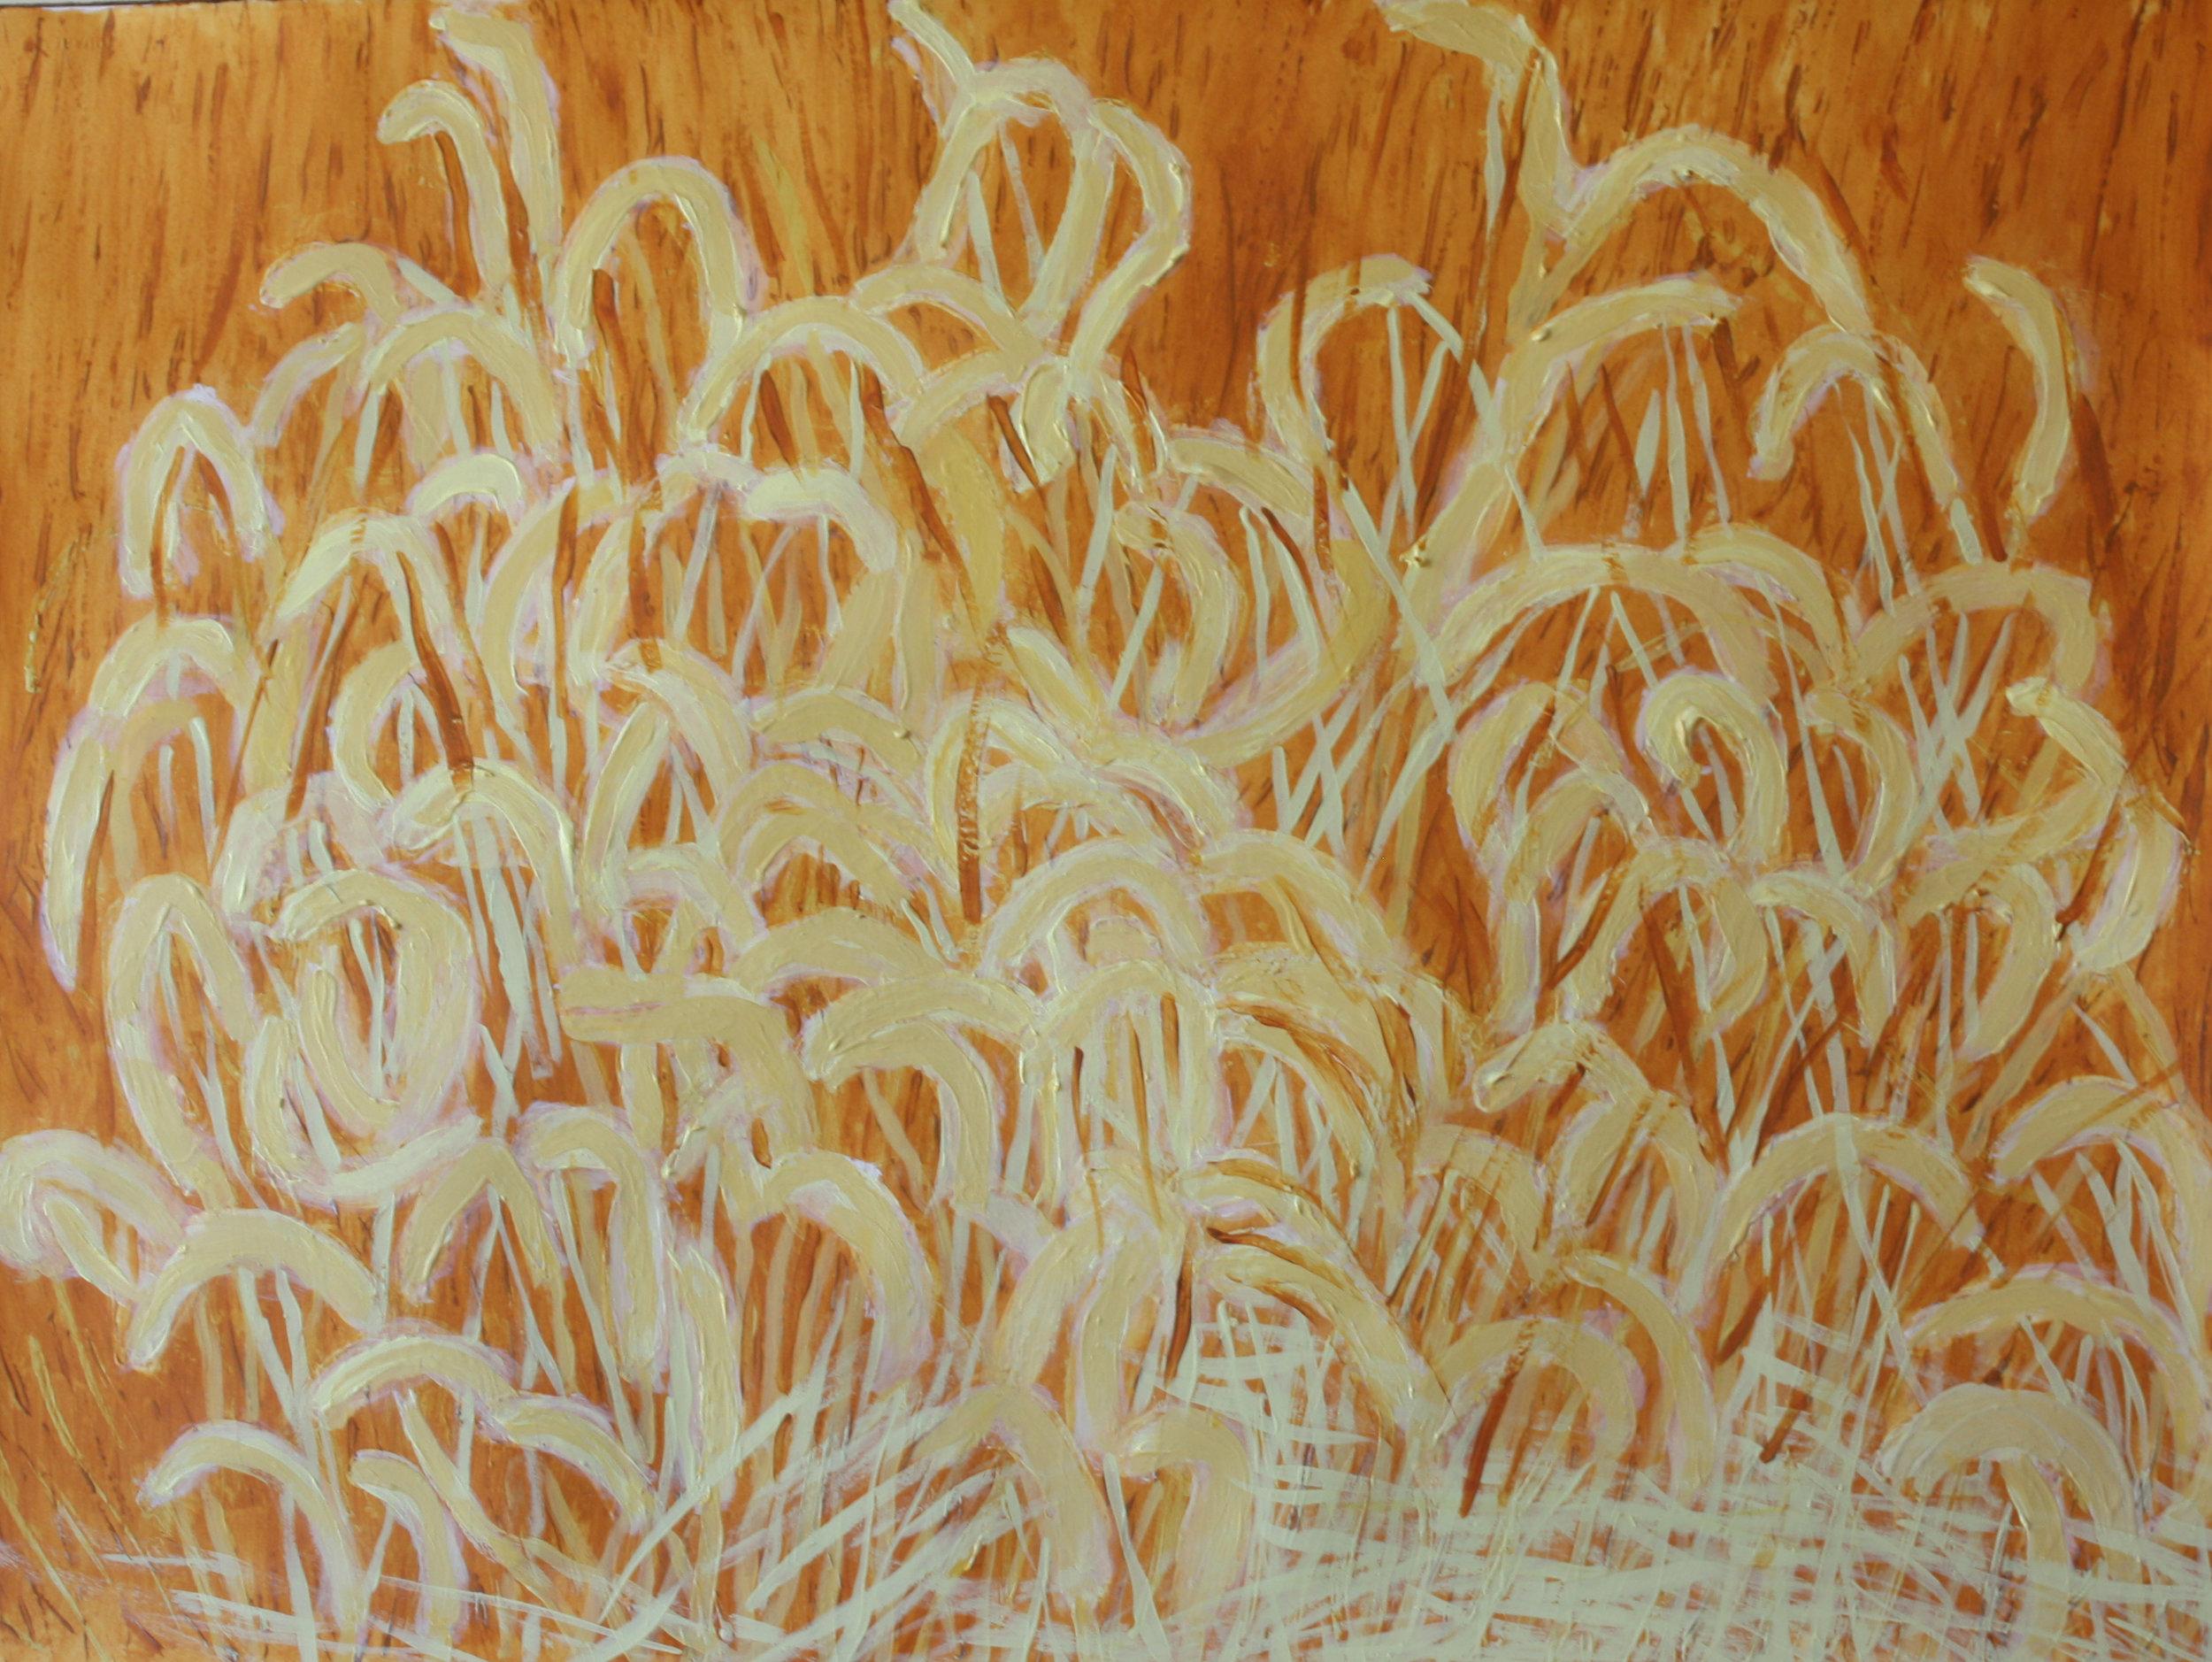 Fall Breeze  22x30 acrylic on paper